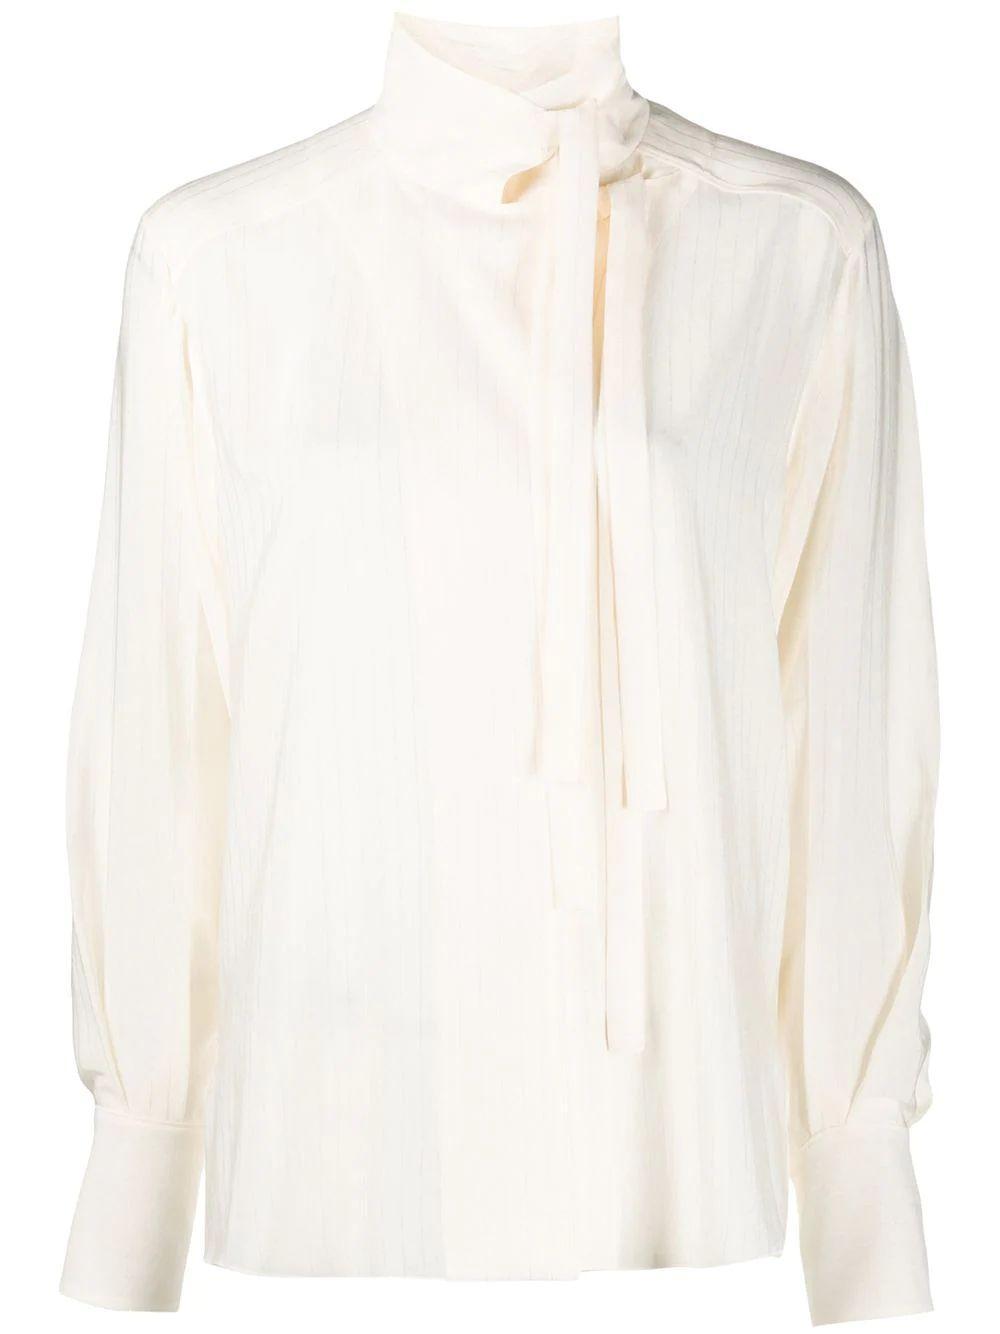 Stripe Silk Jacquard Blouse Item # CHC20UHT76307